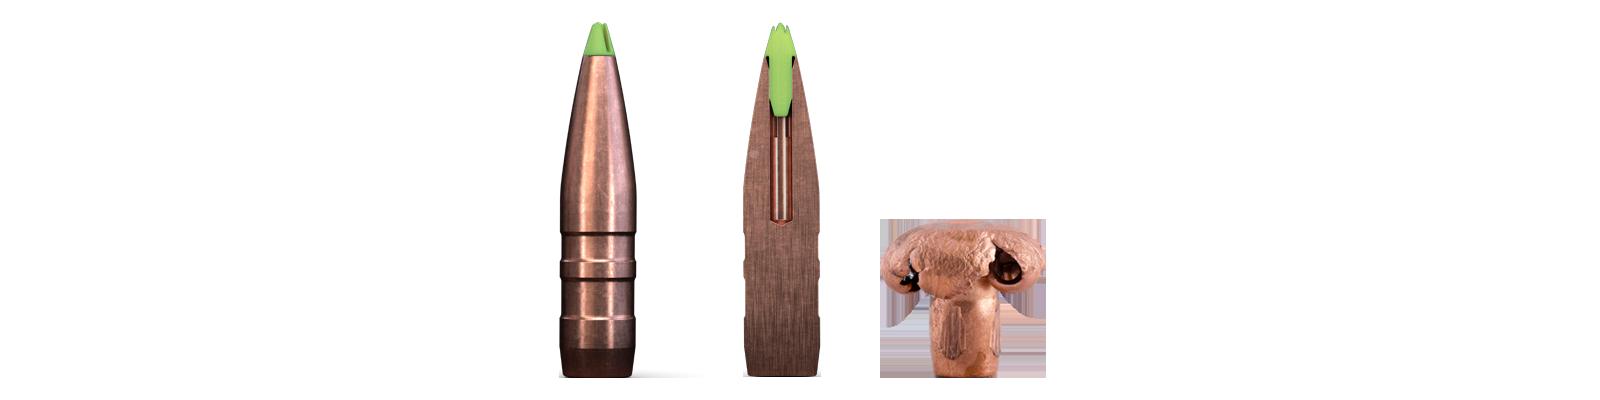 Sako 30-06 Sprg Powerhead Blade (657A) 11g, 20 kpl / ras